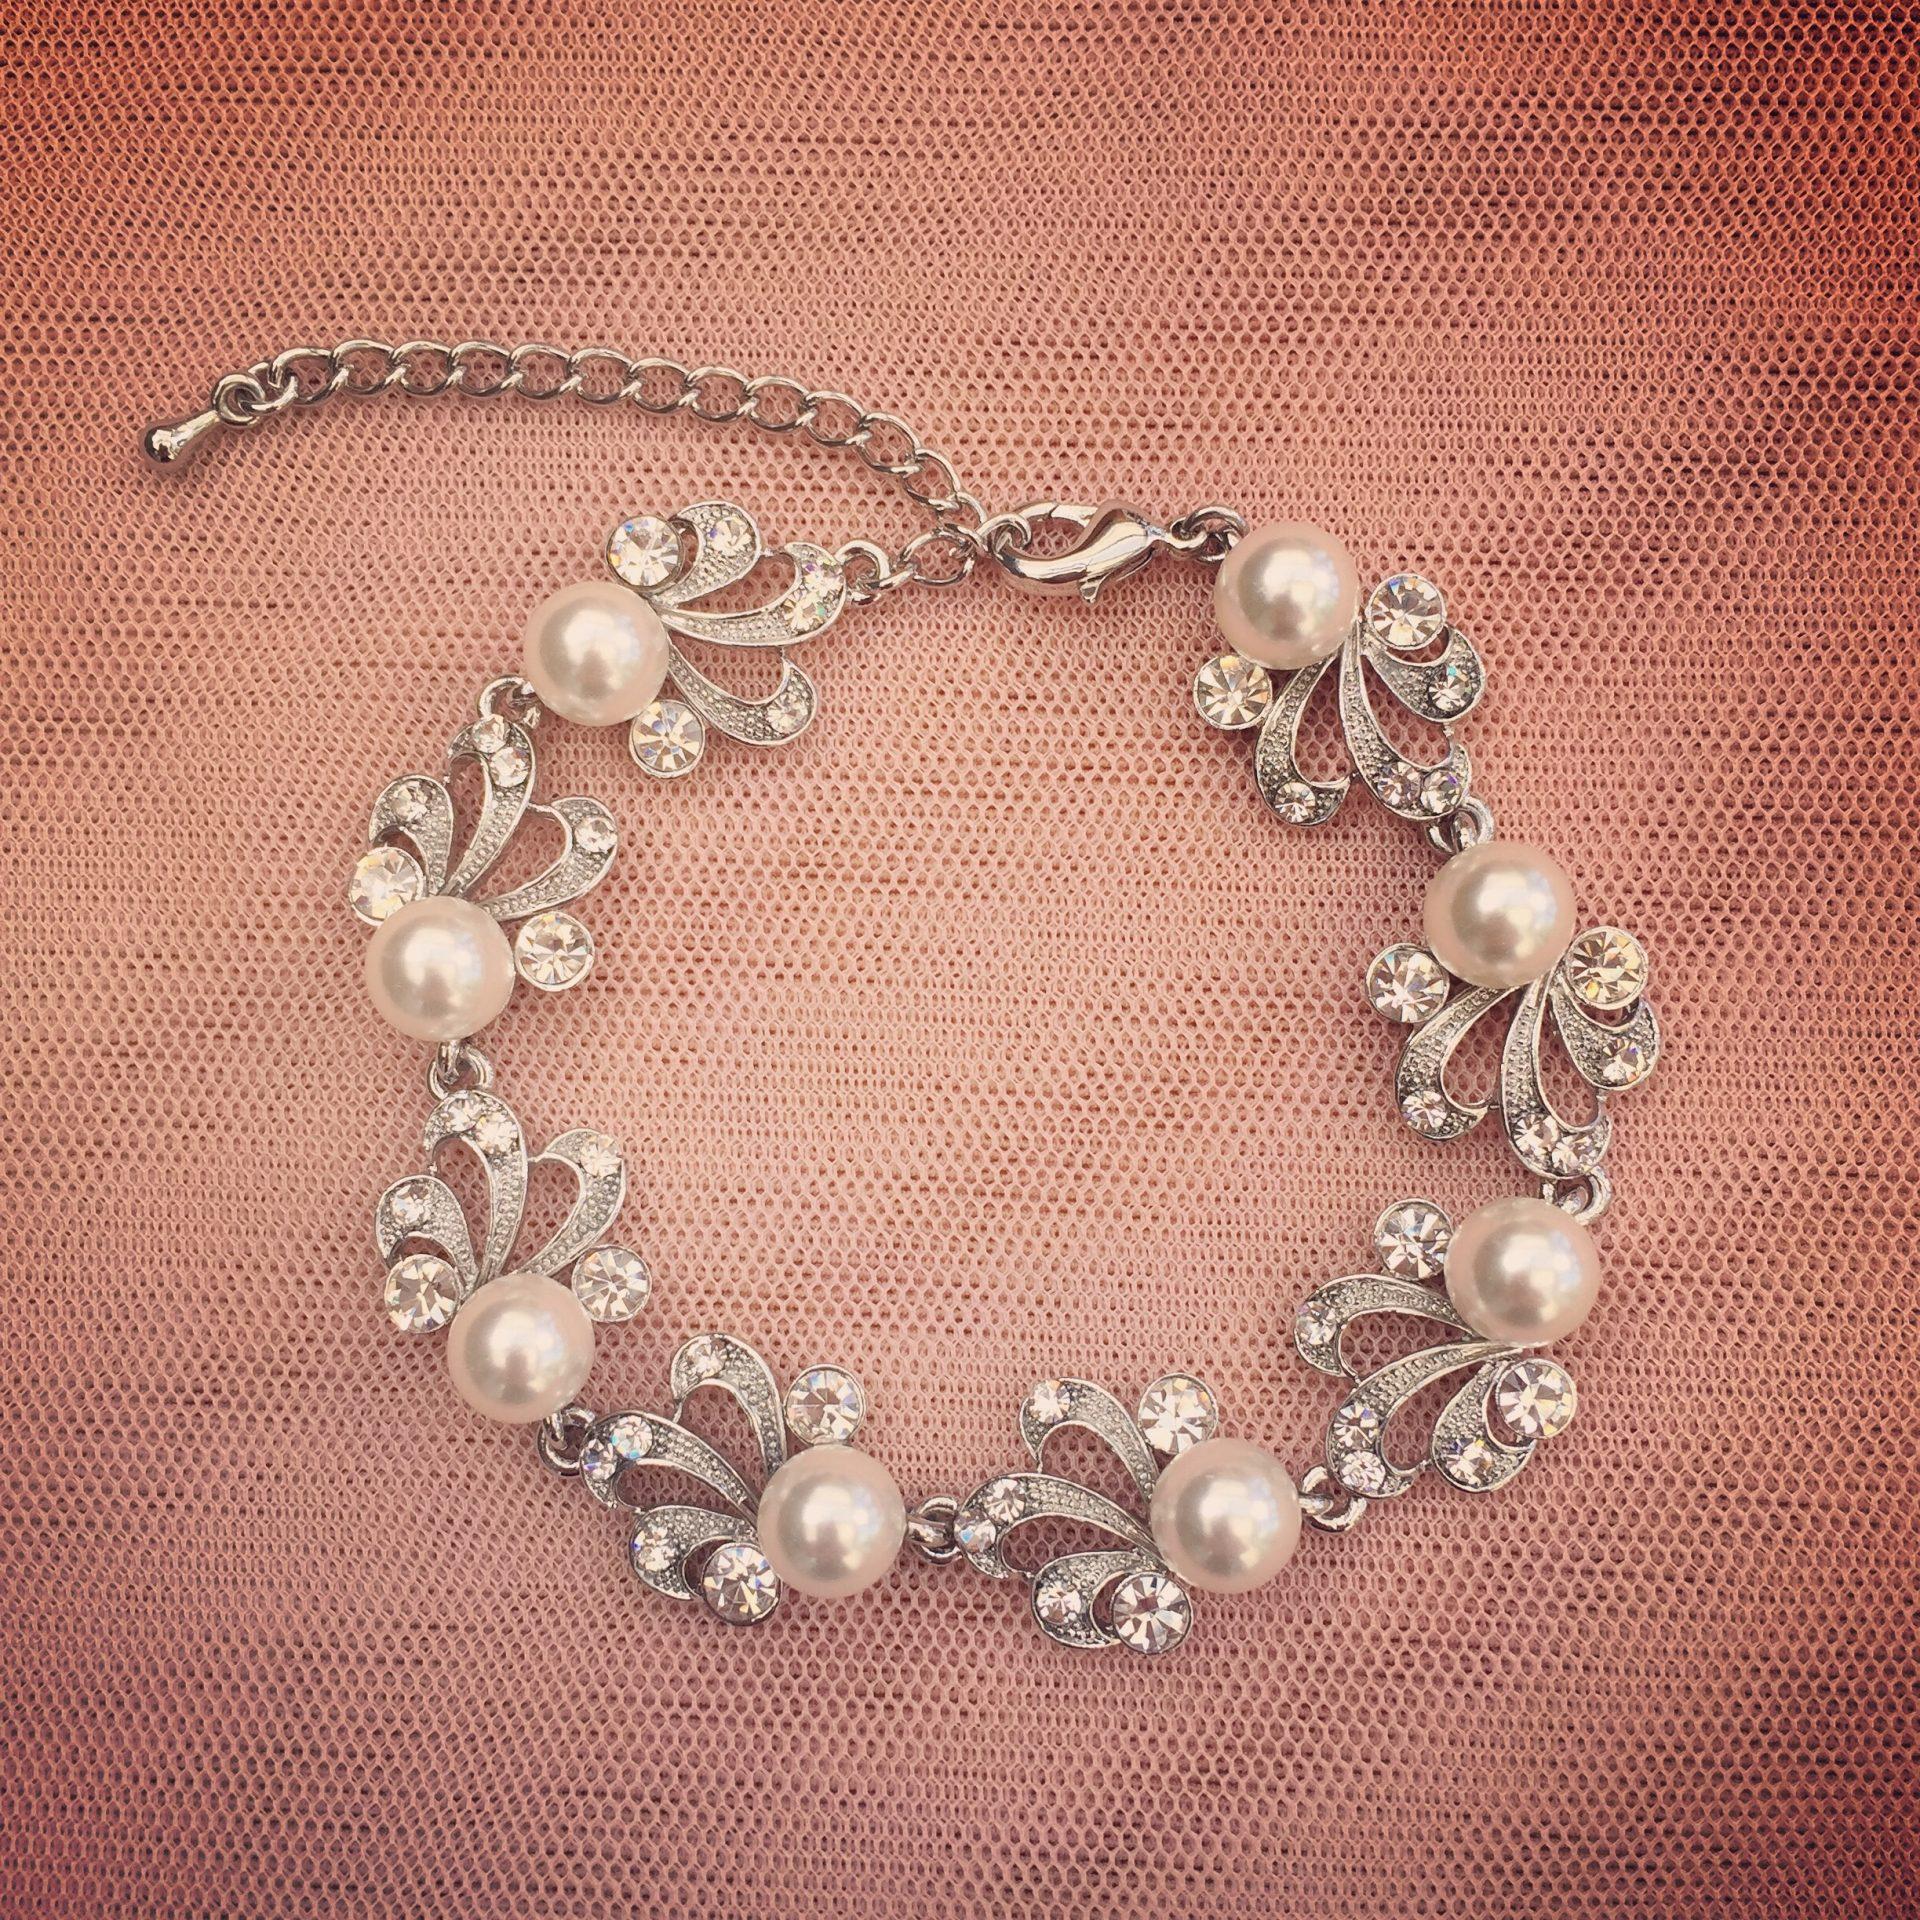 9. Gatsby – Bracelet